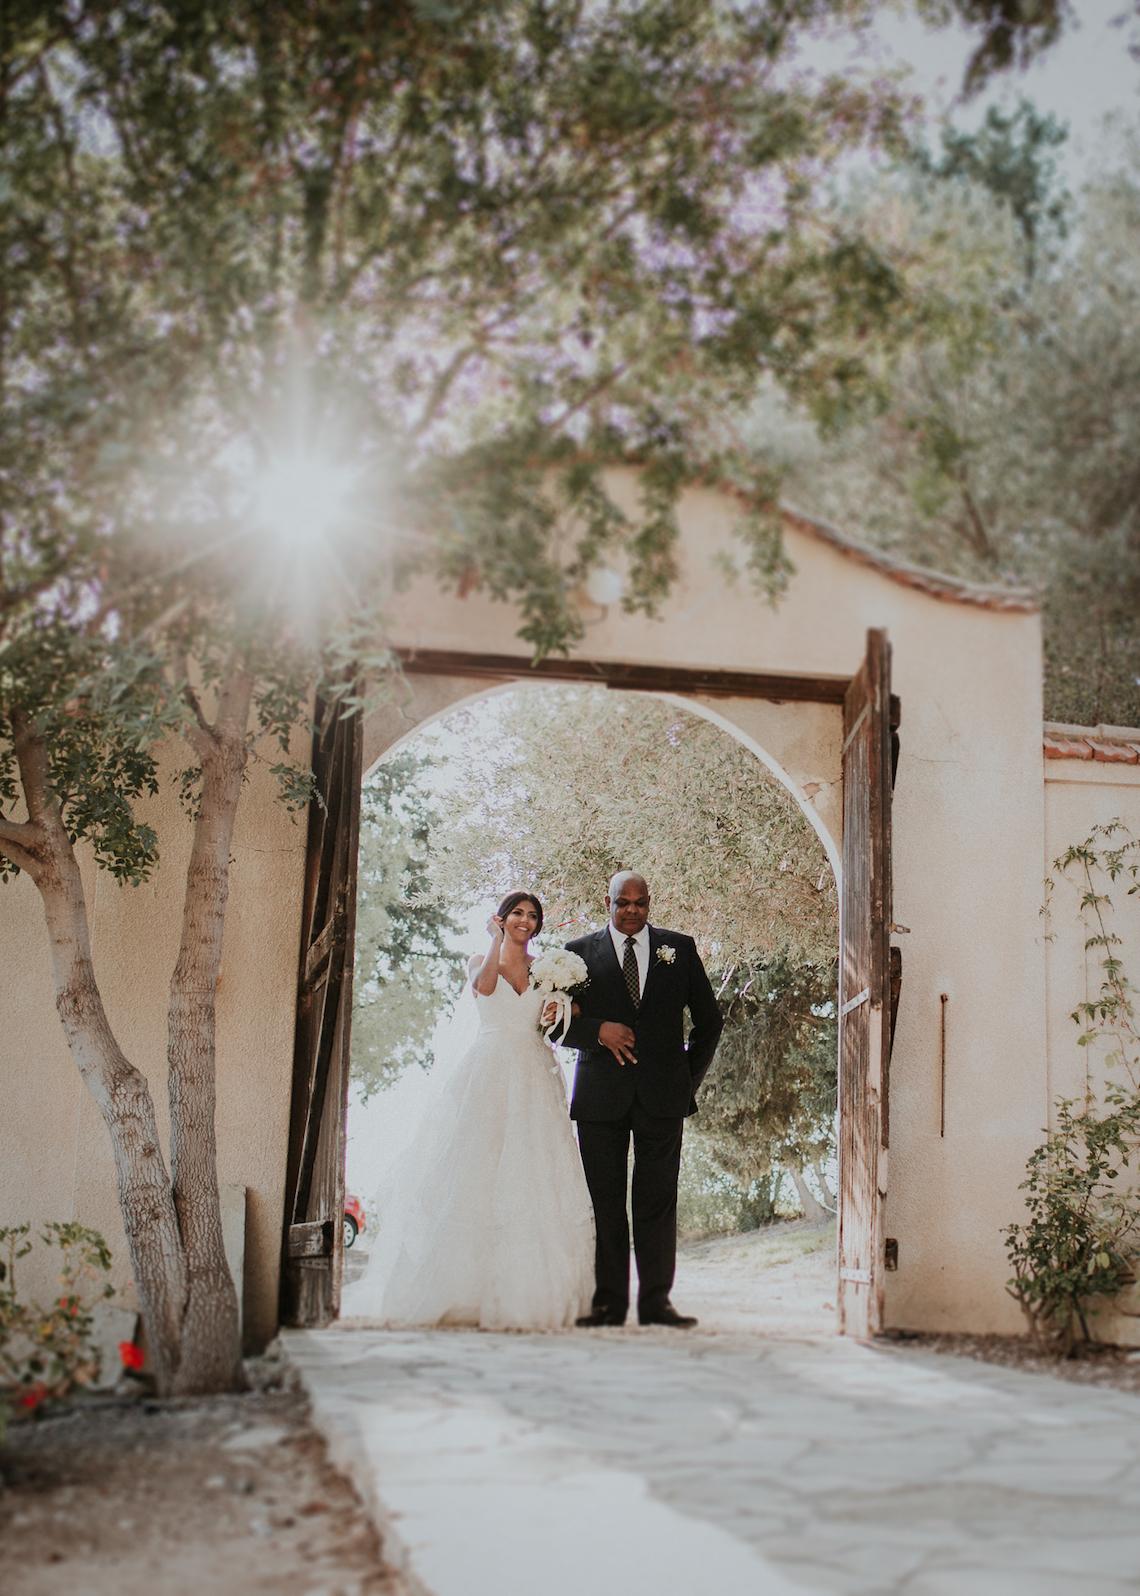 Romantic Olive Grove Cyprus Destination Wedding | Karina Leonenko Photography 27